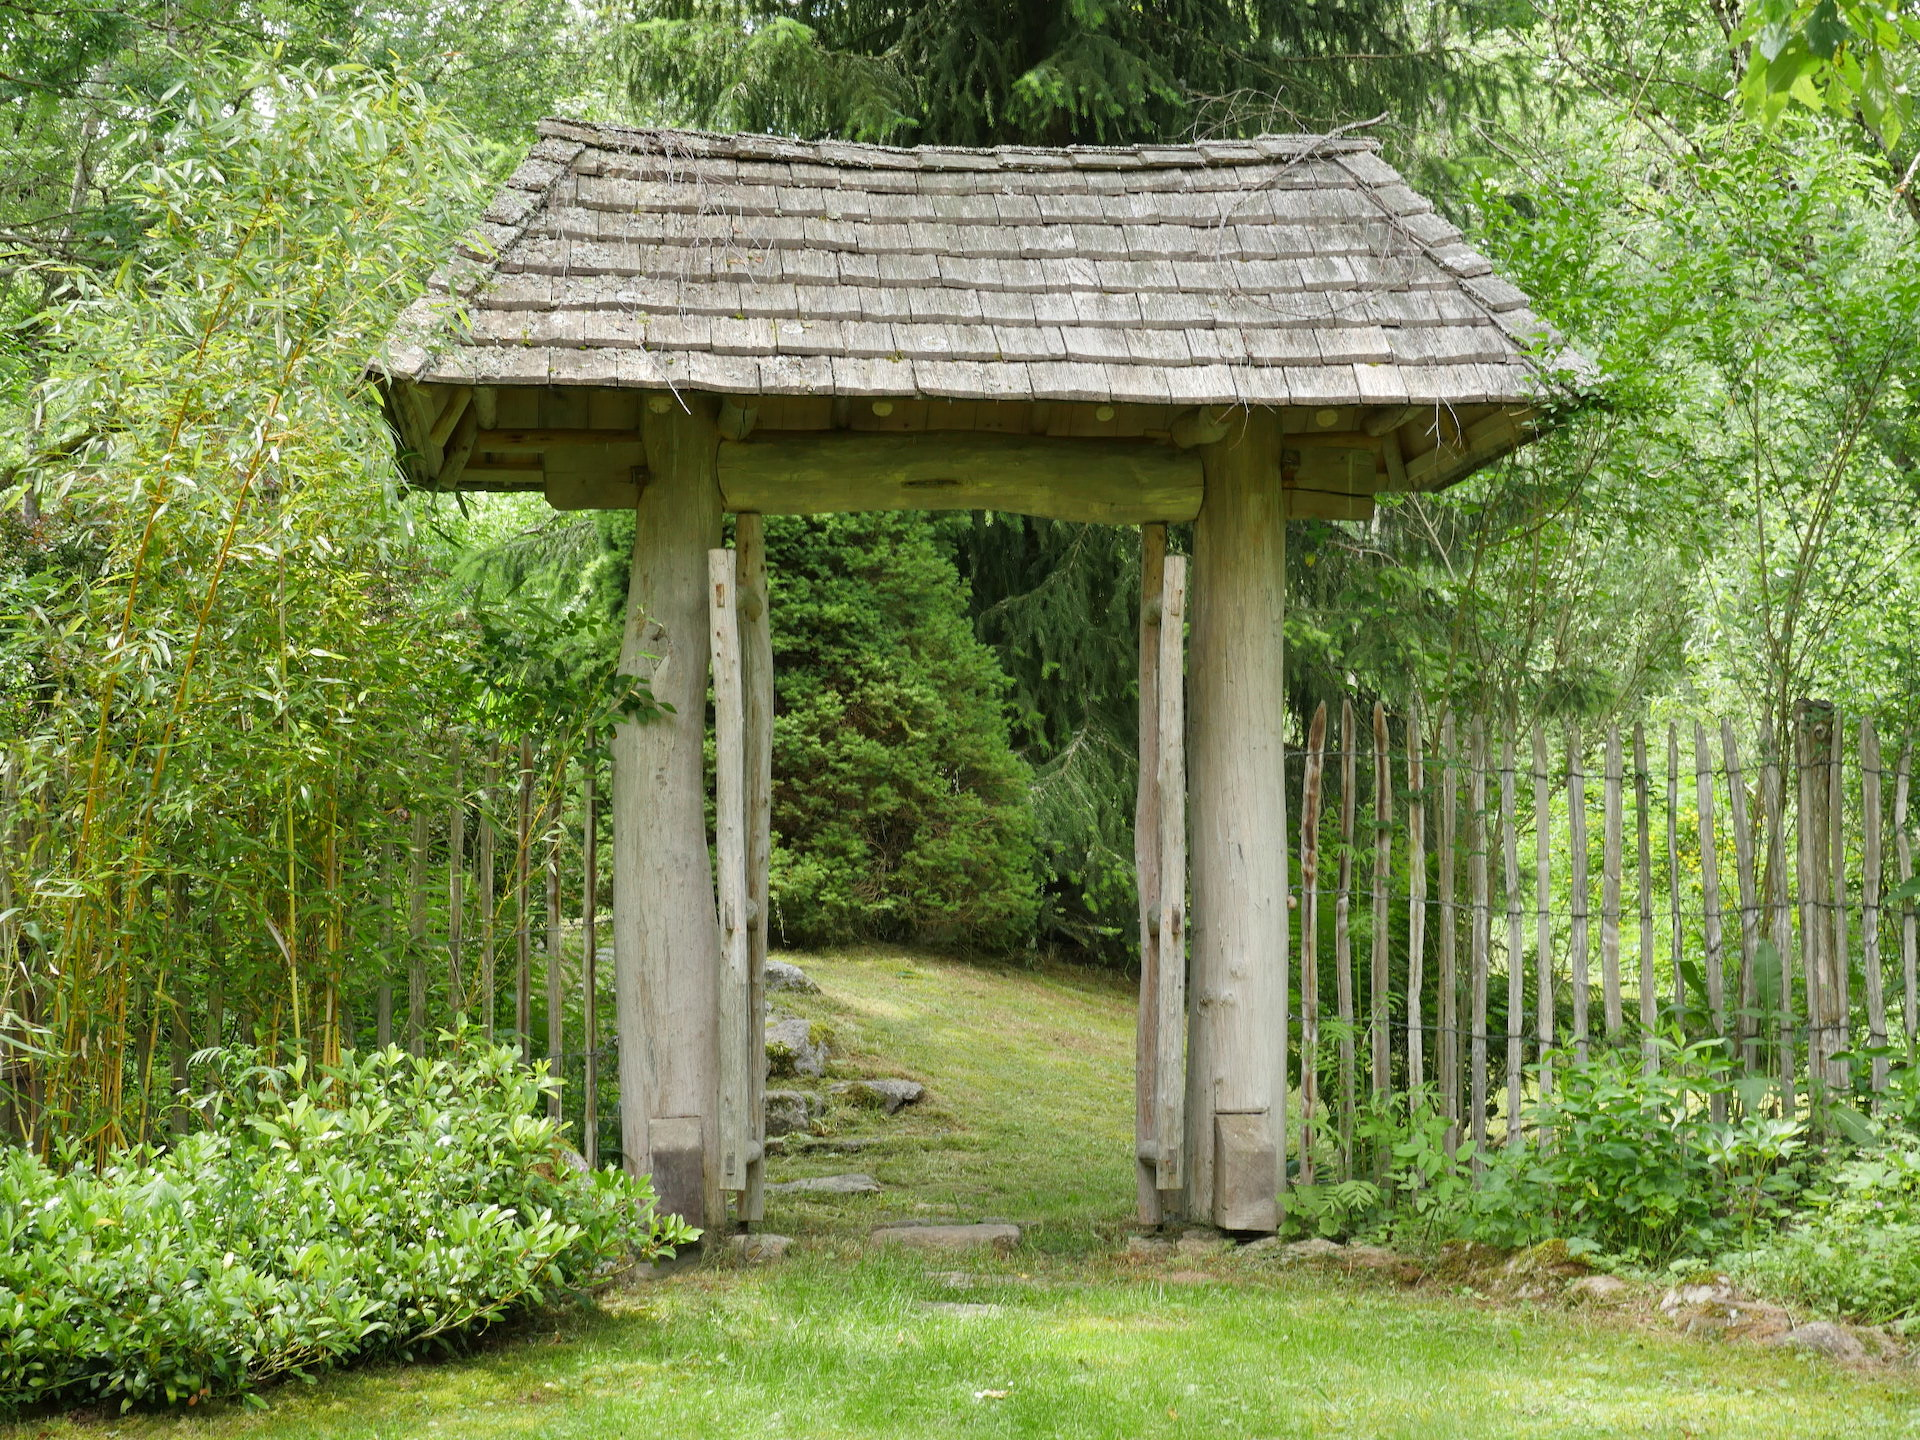 zen zazen meditation johanneshof hotzenhaus dharma sangha baker roshi buddhismus garten tori japanisches Tor